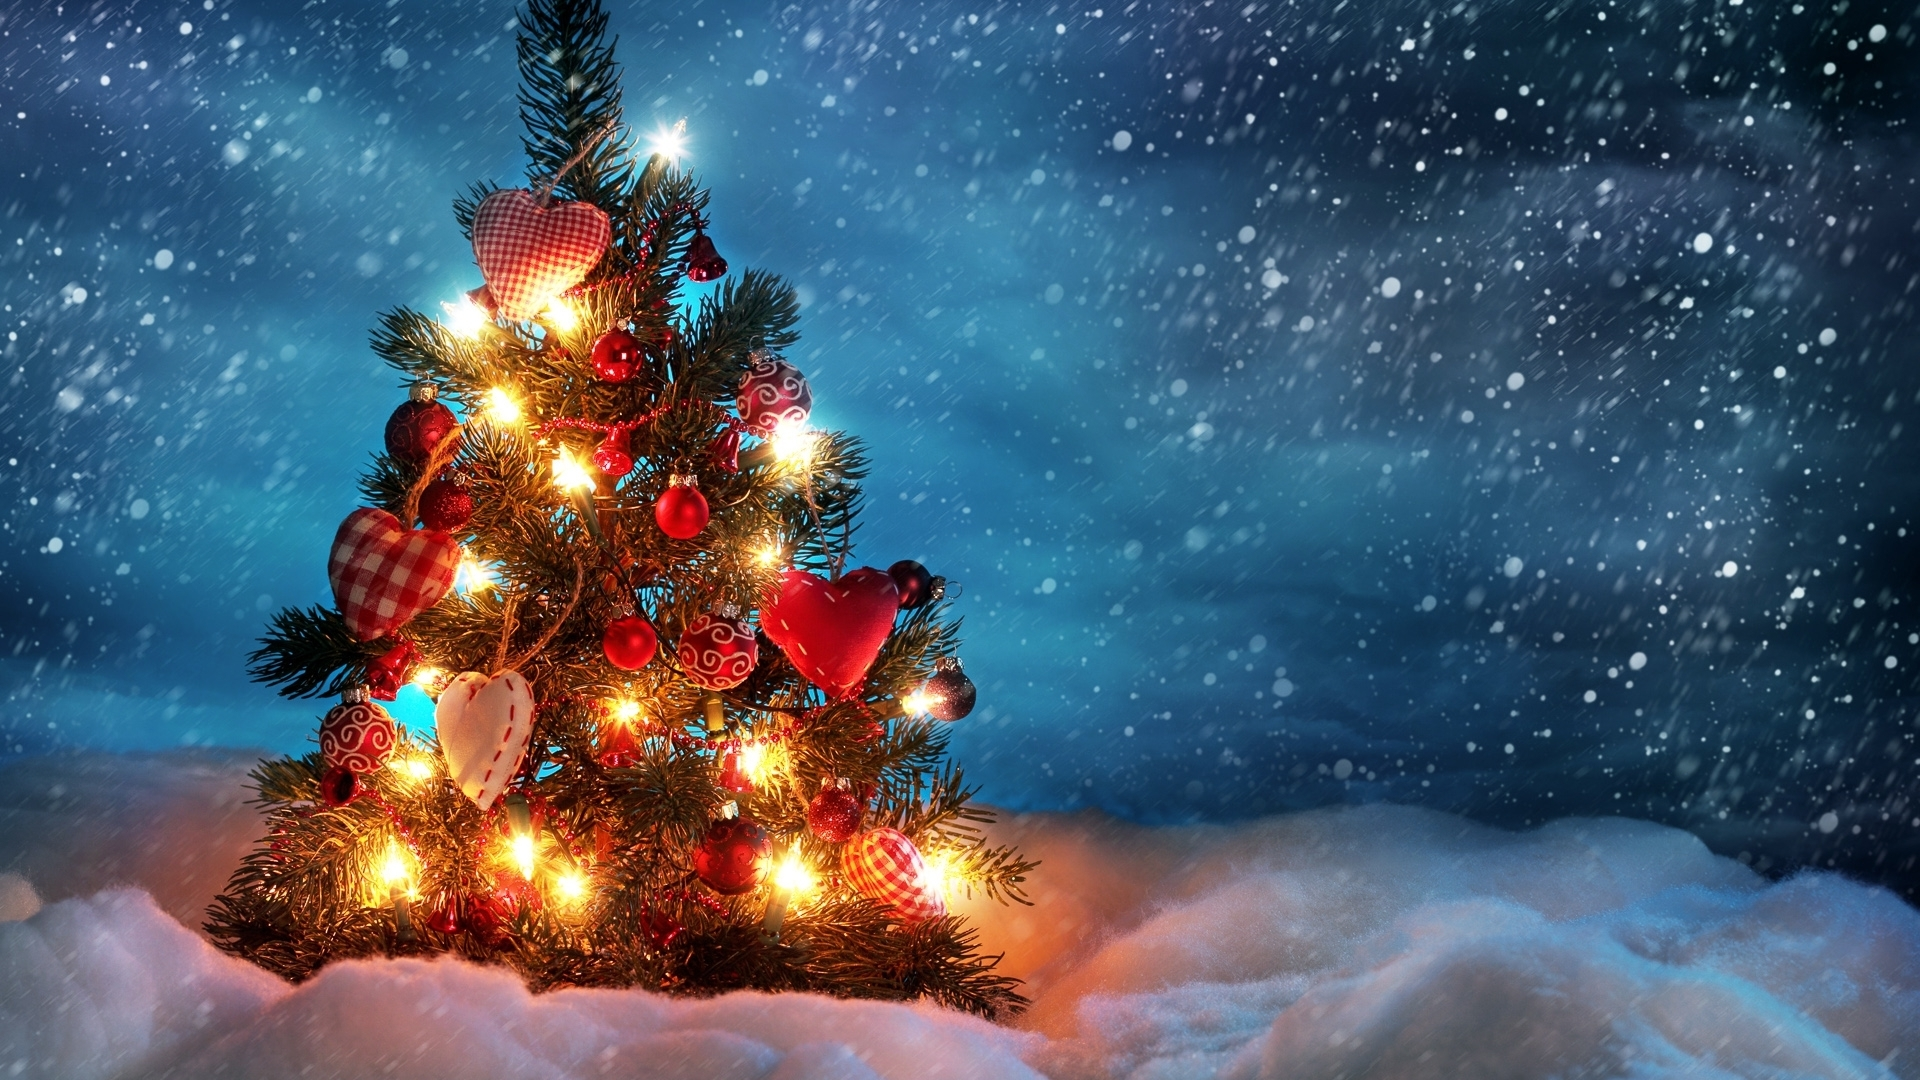 download wallpaper 1920x1080 christmas tree, snow, winter full hd